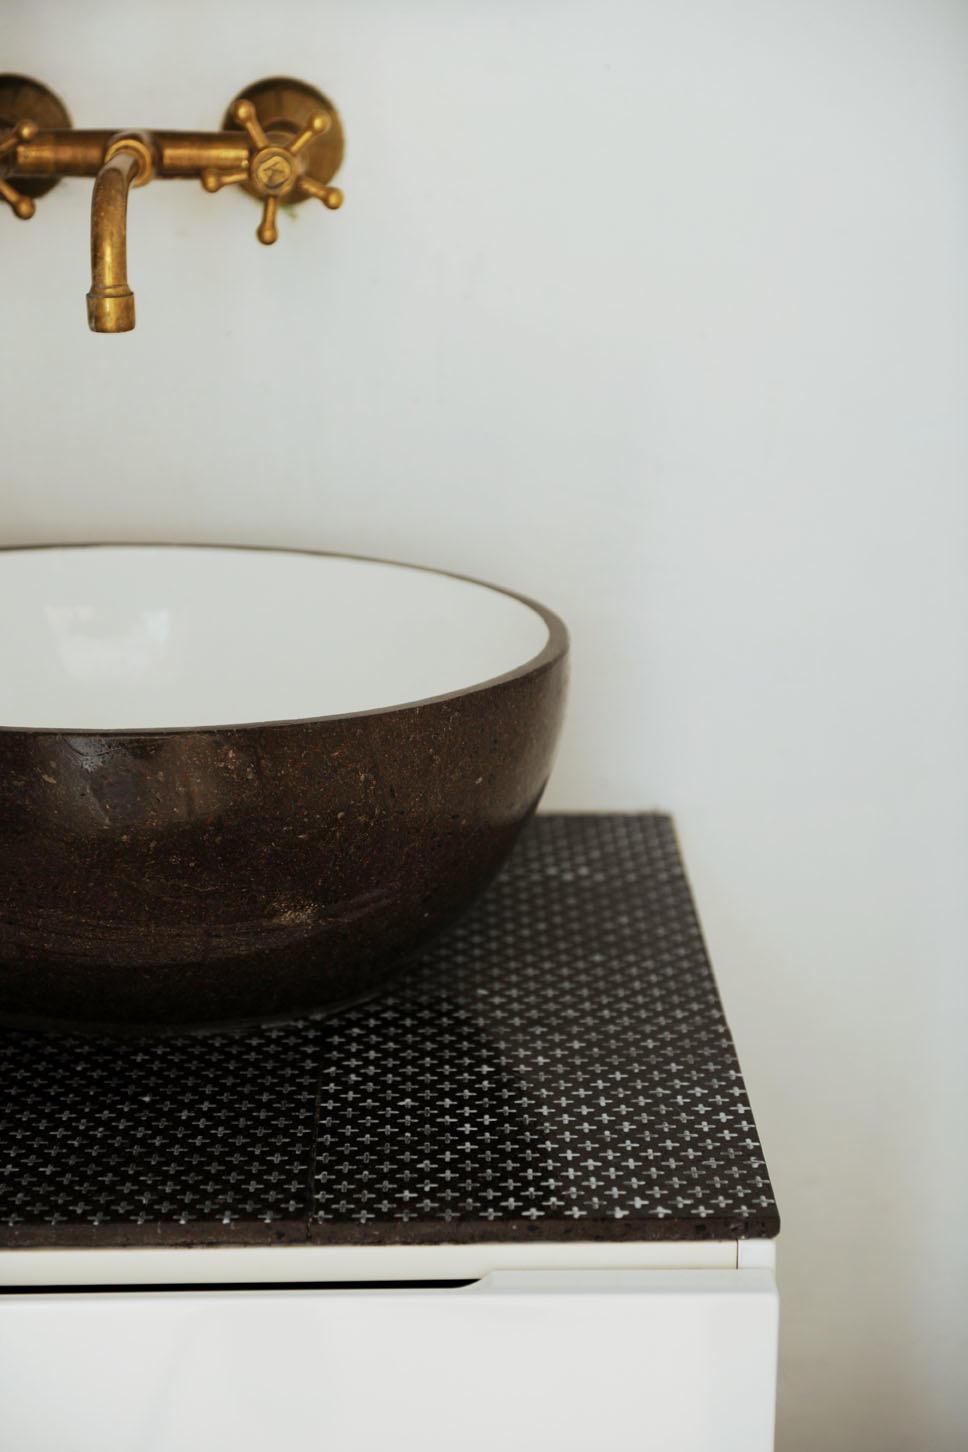 ... Aqua   Bespoke Sink By Made A Mano ...